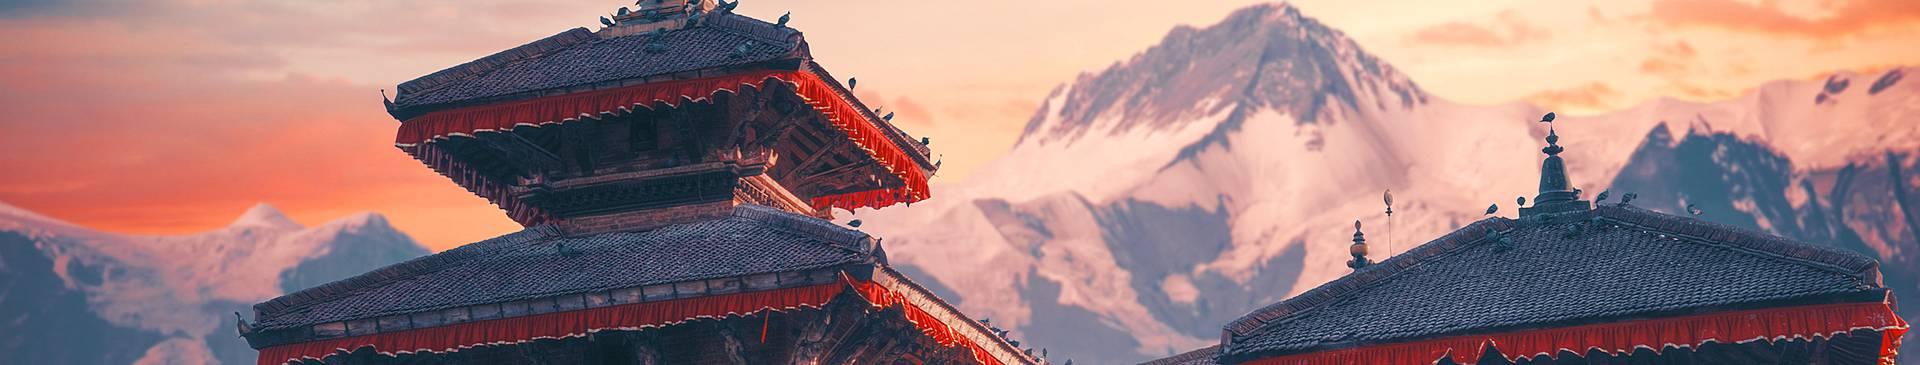 Cities in Nepal